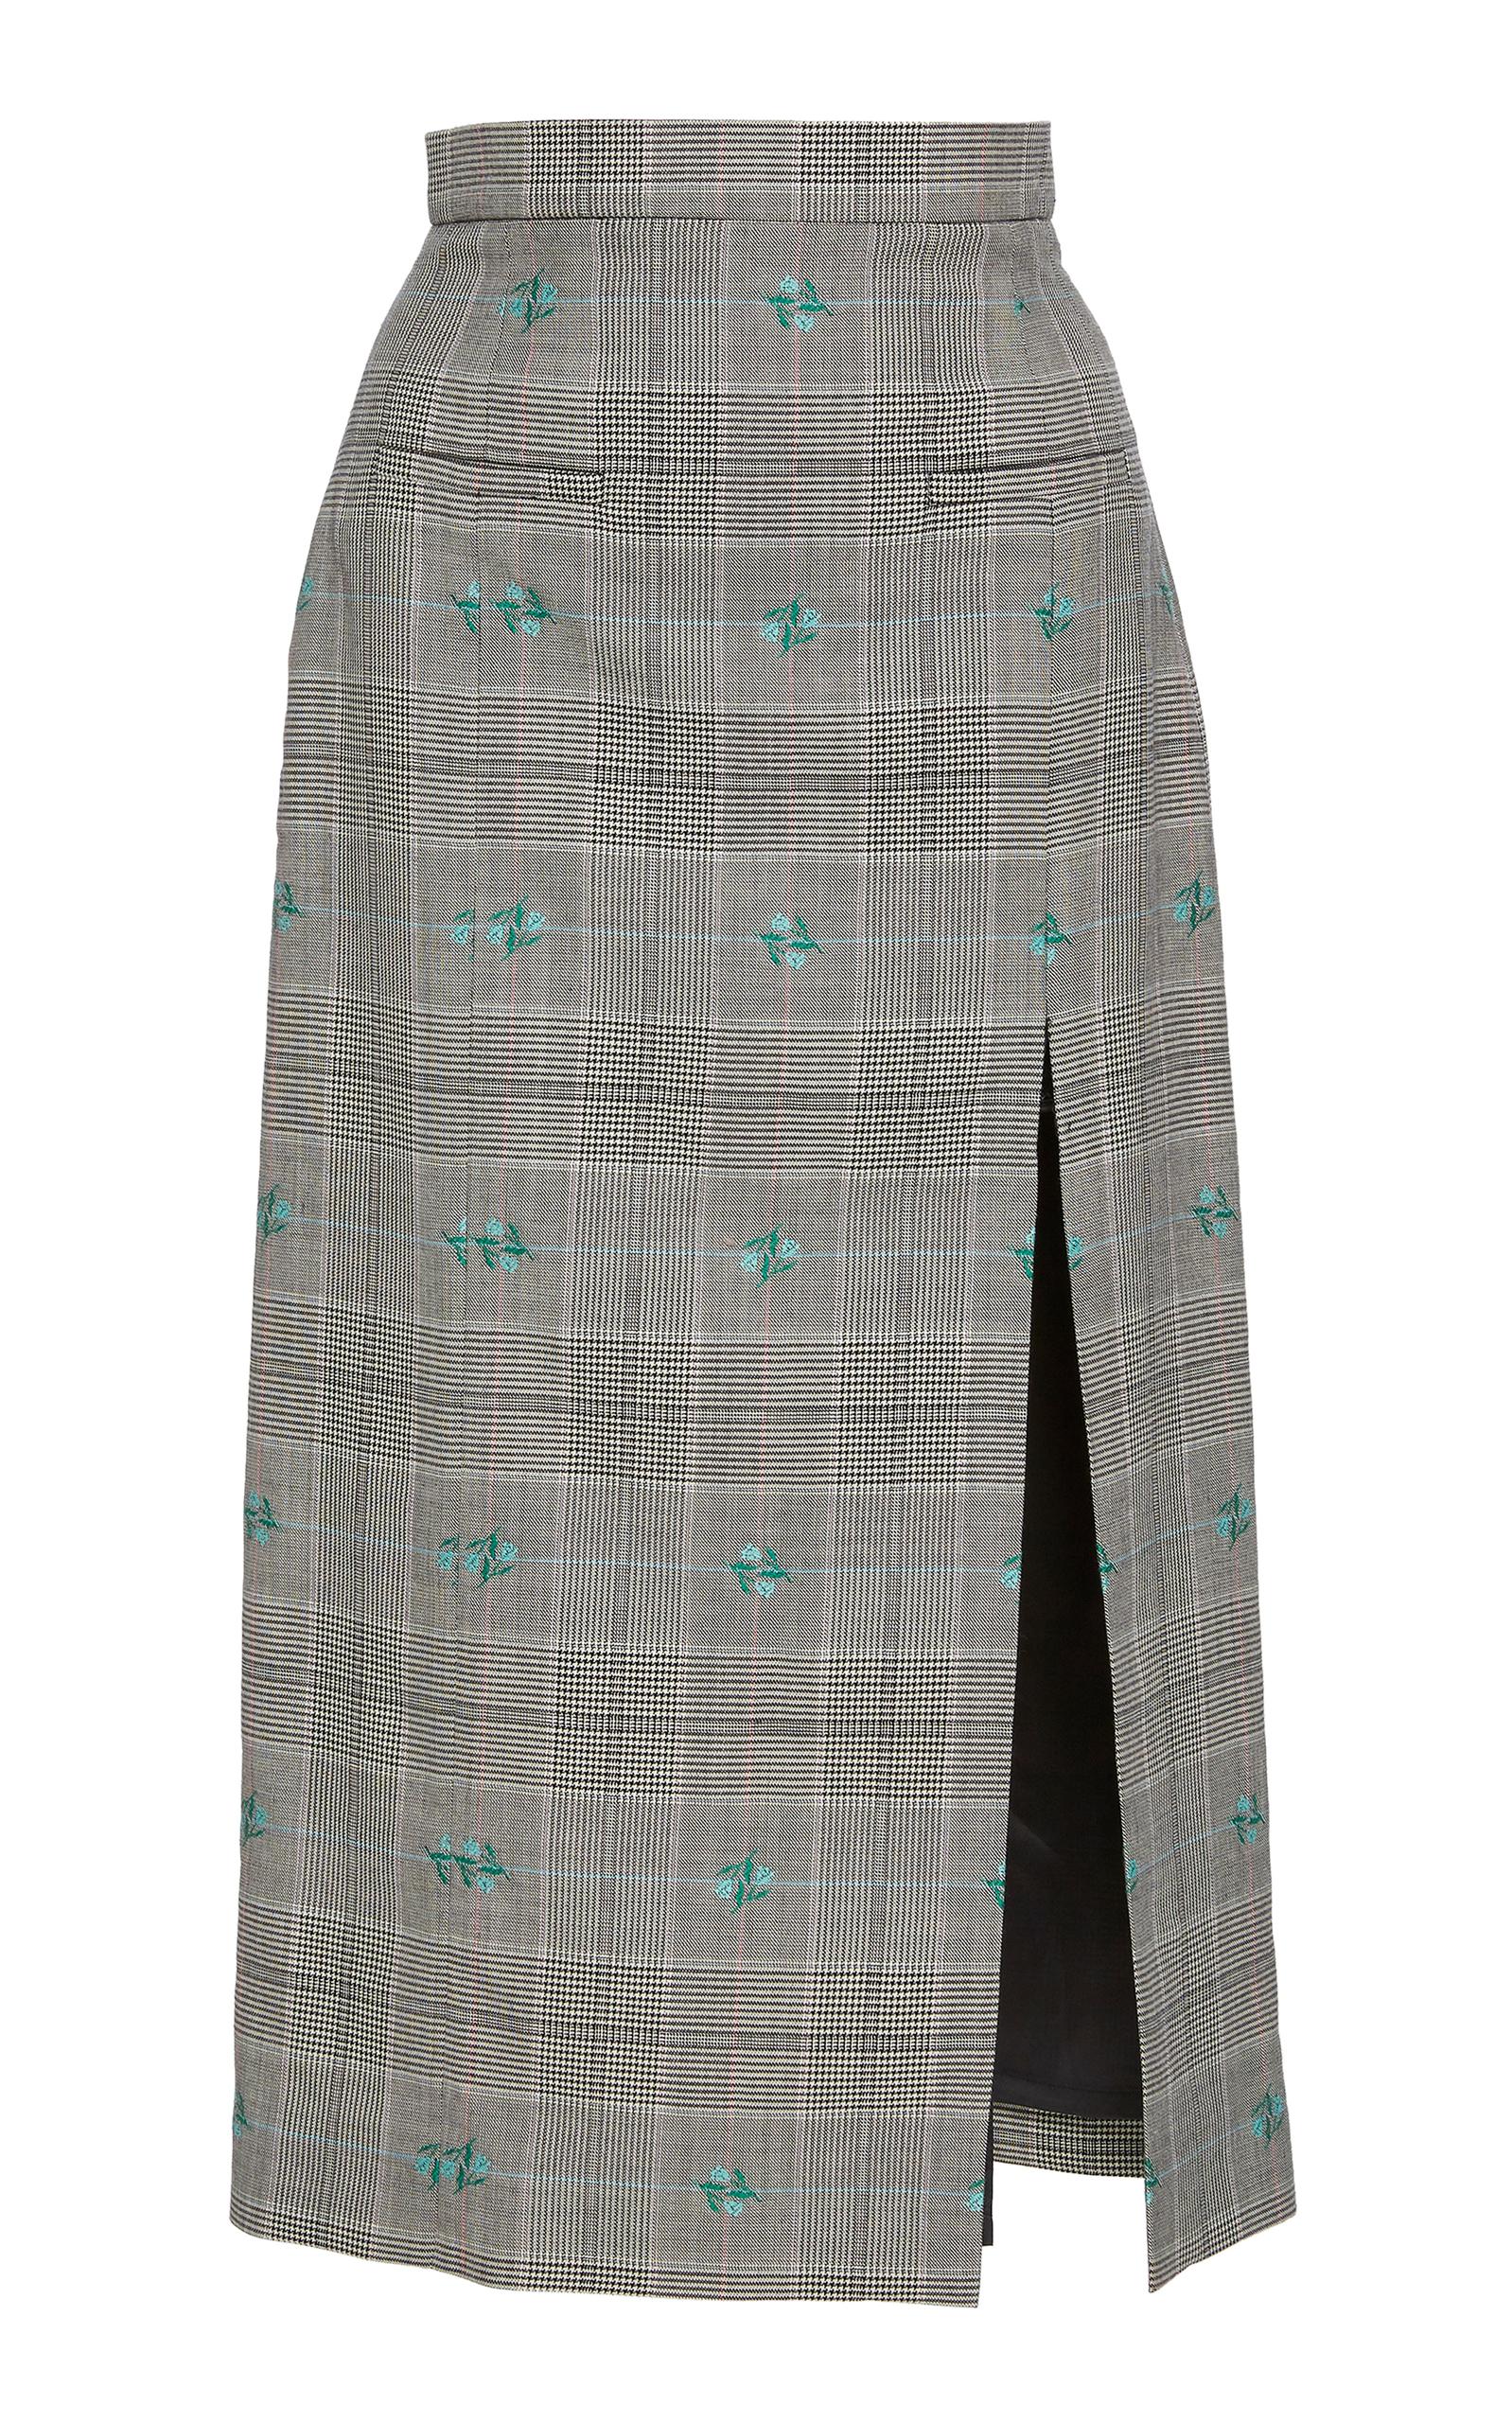 Alexa Chung Woman Crocheted Cotton-blend Mini Skirt Multicolor Size M AlexaChung New Arrival Discount New Arrival Discount Marketable cEC9363zcA